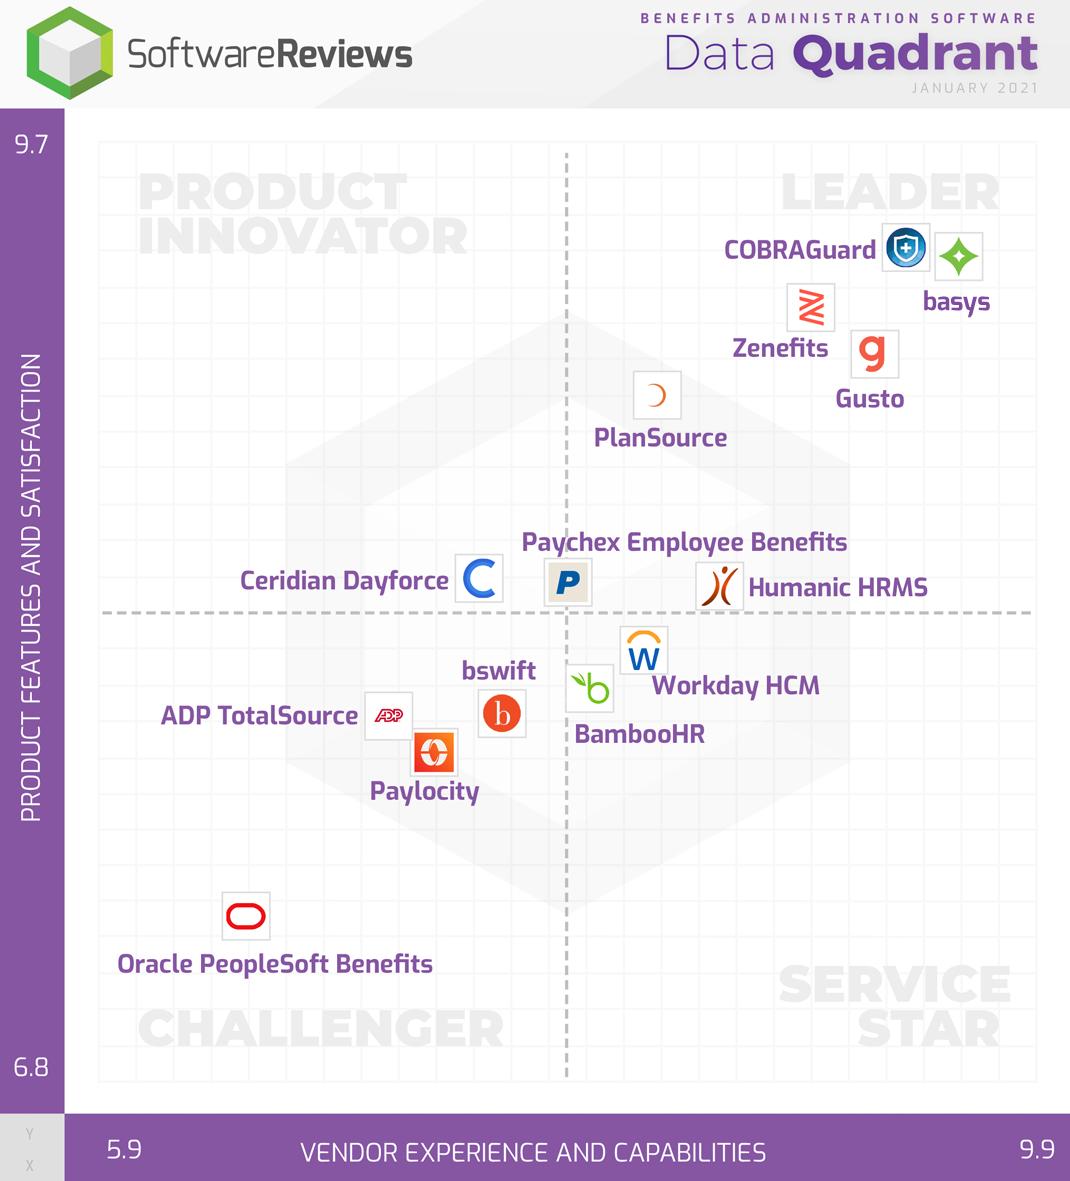 Benefits Administration Software Data Quadrant